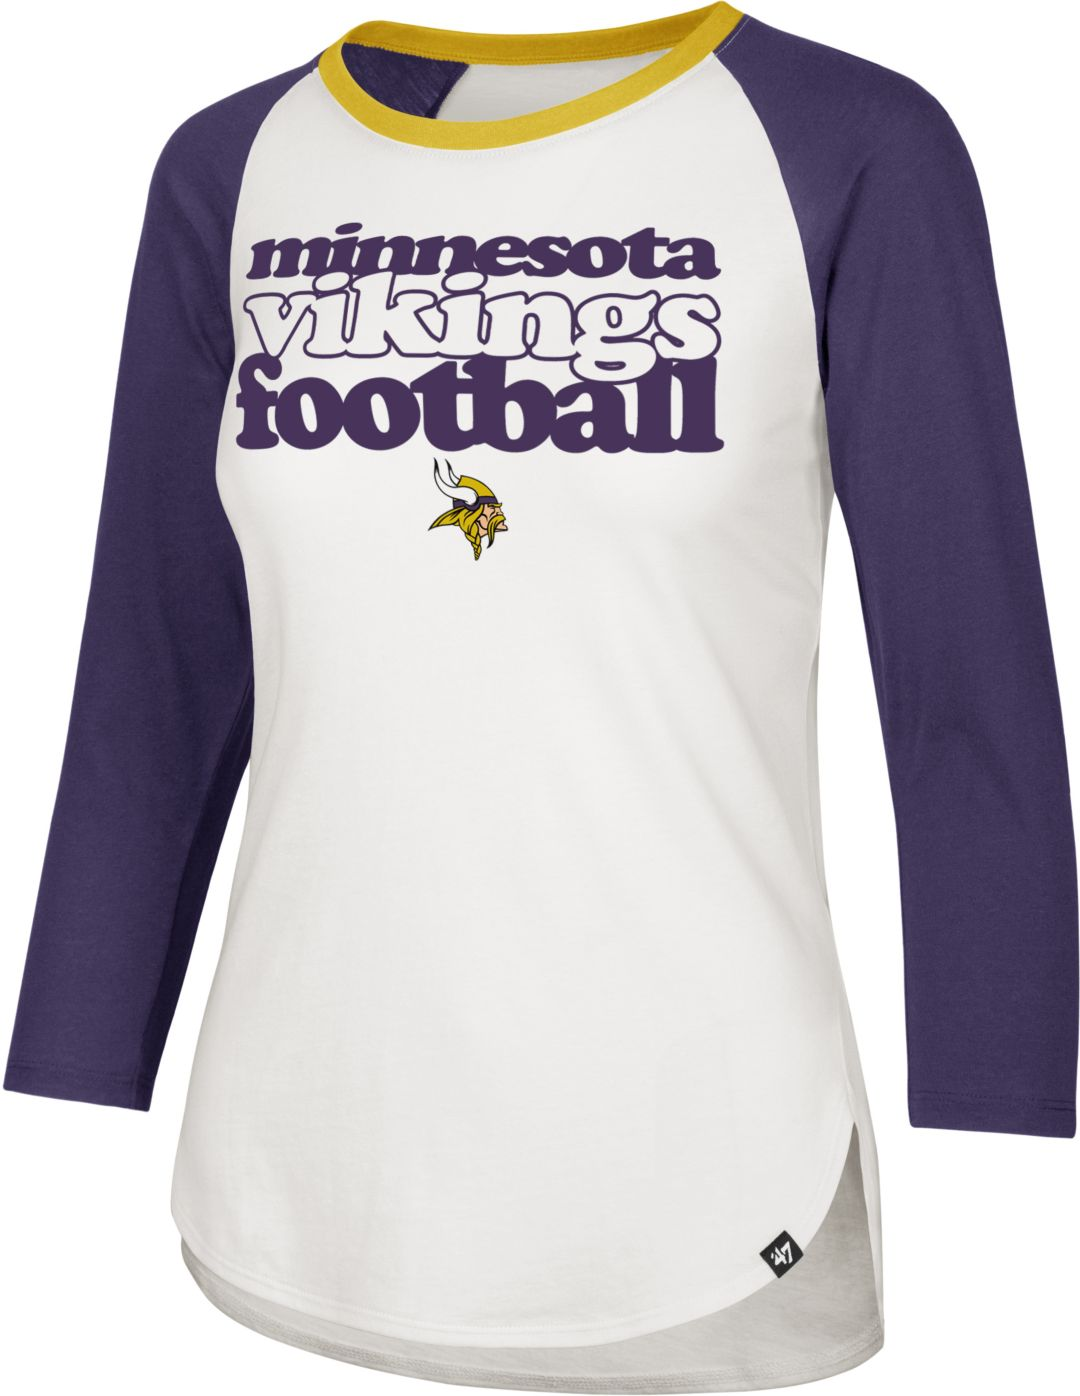 competitive price 25260 05664 '47 Women's Minnesota Vikings Retro Stock Throwback Raglan Shirt